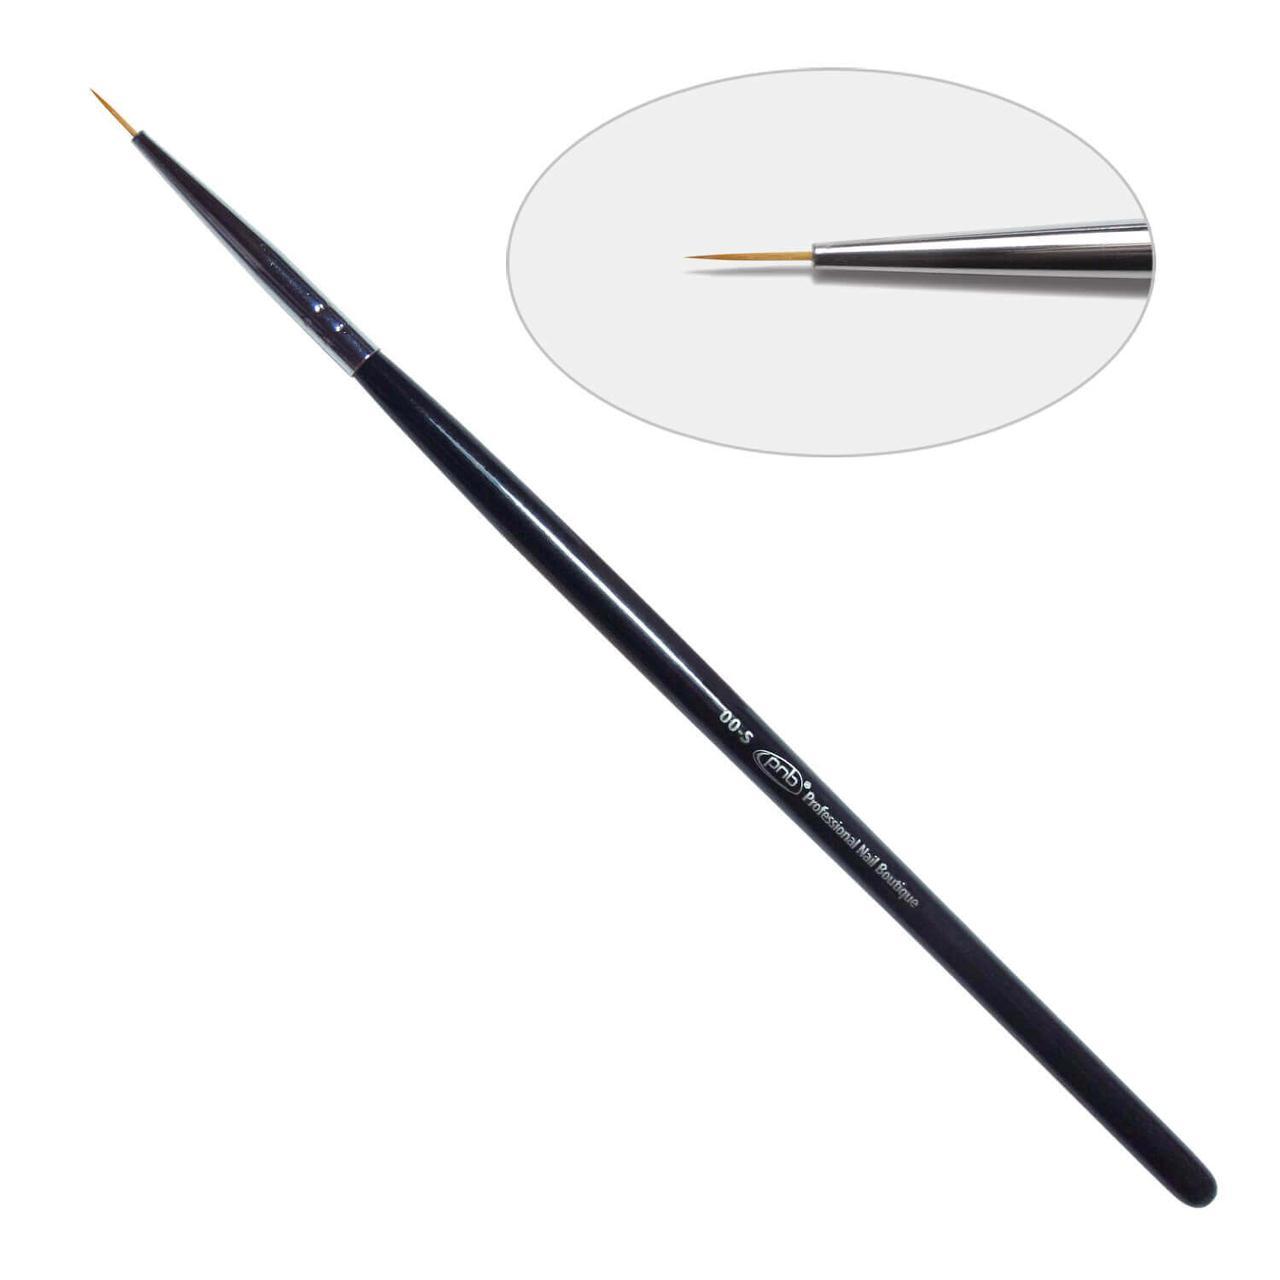 Кисть для дизайна круглая 00-s PNB, нейлон/ Nail Art Brush round 00-s, nylon